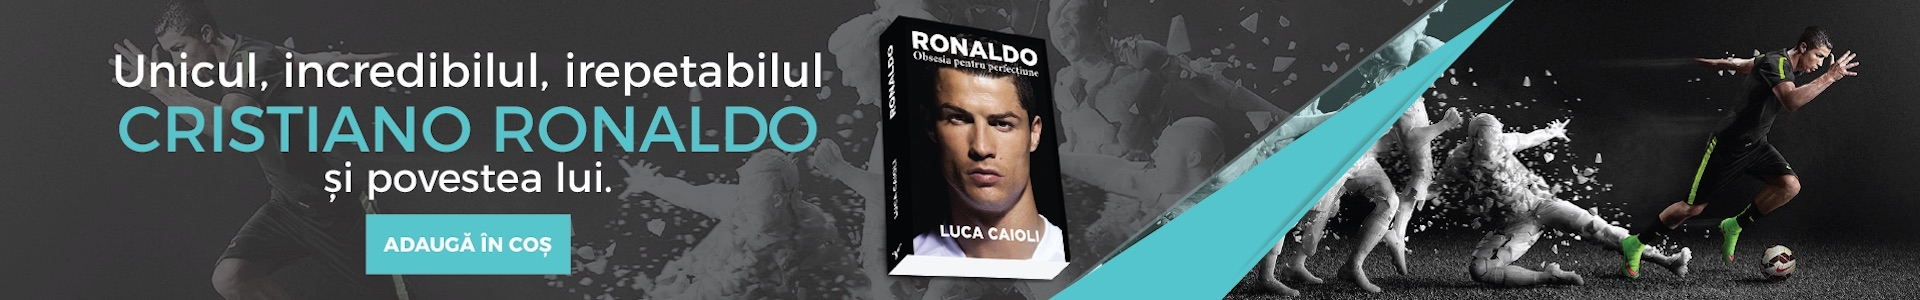 Colectia iBall | Dedicata fotbalului si eroilor sai